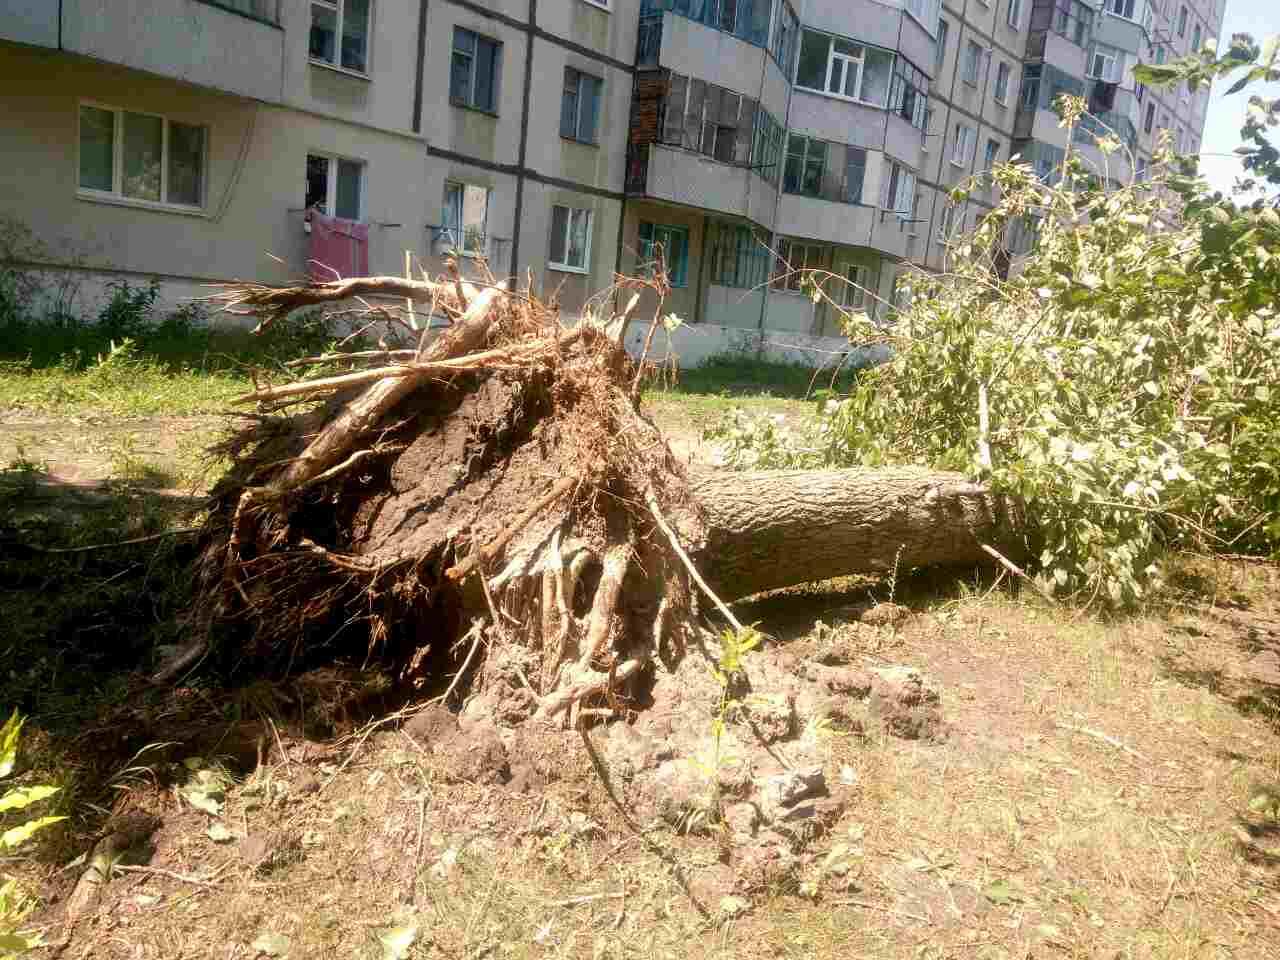 uragan_kovsharovka6.jpg